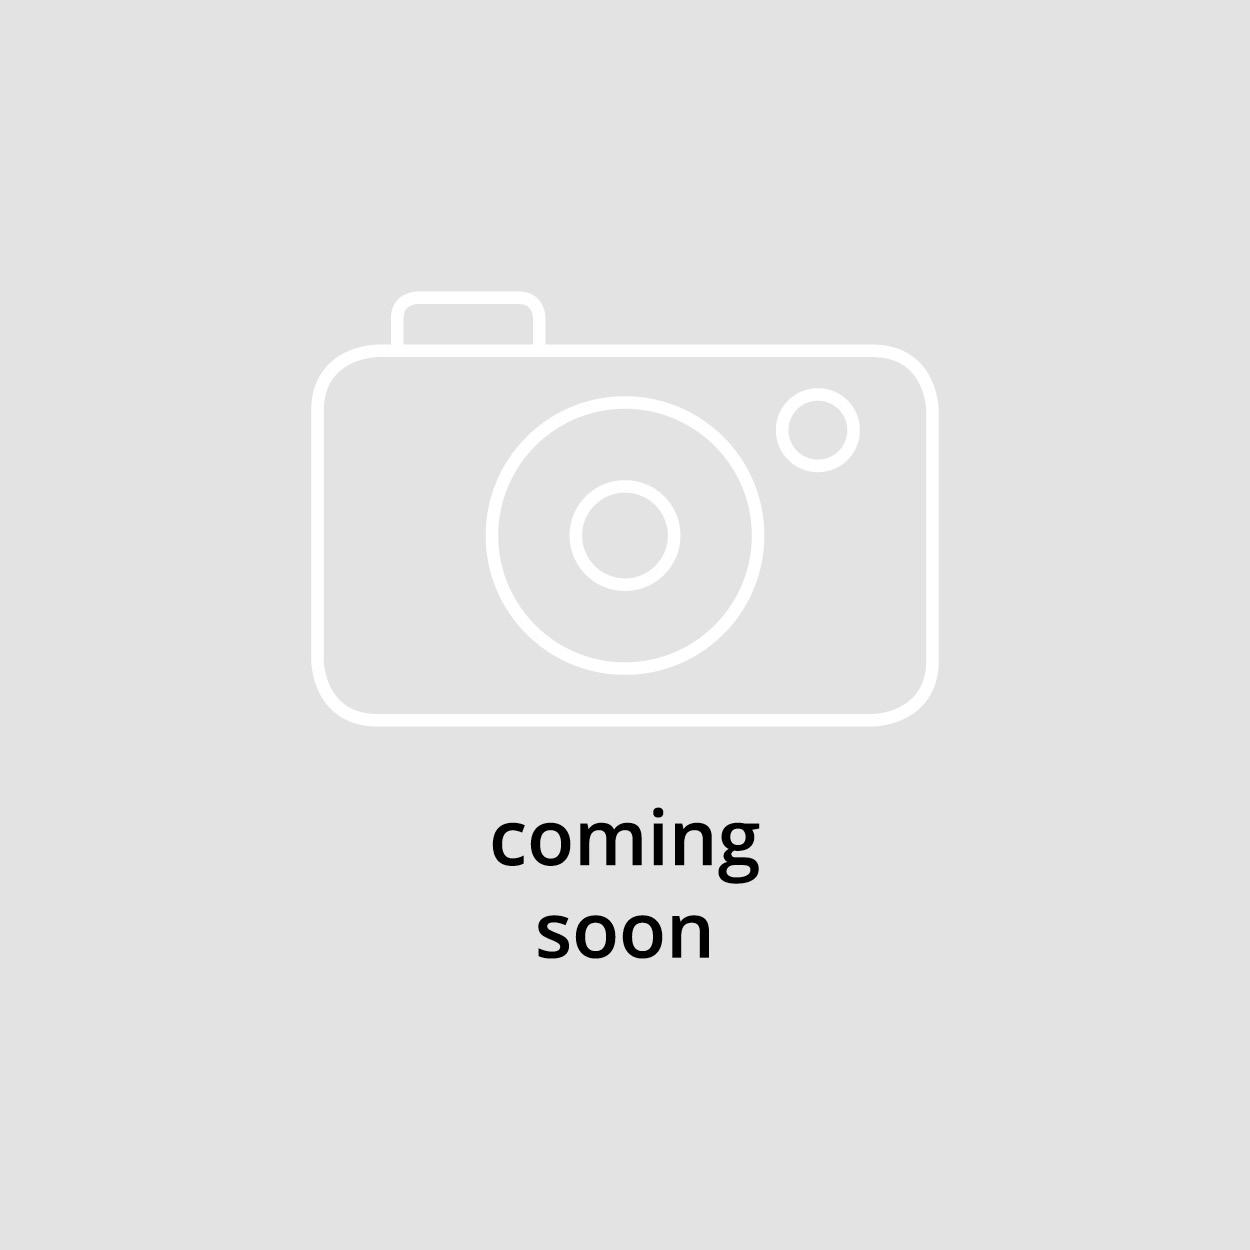 15.01.003 Molla a tazza per apertura chiusura pinza Gildemeister AS16, AS20, GS20, GM20, GM20AC